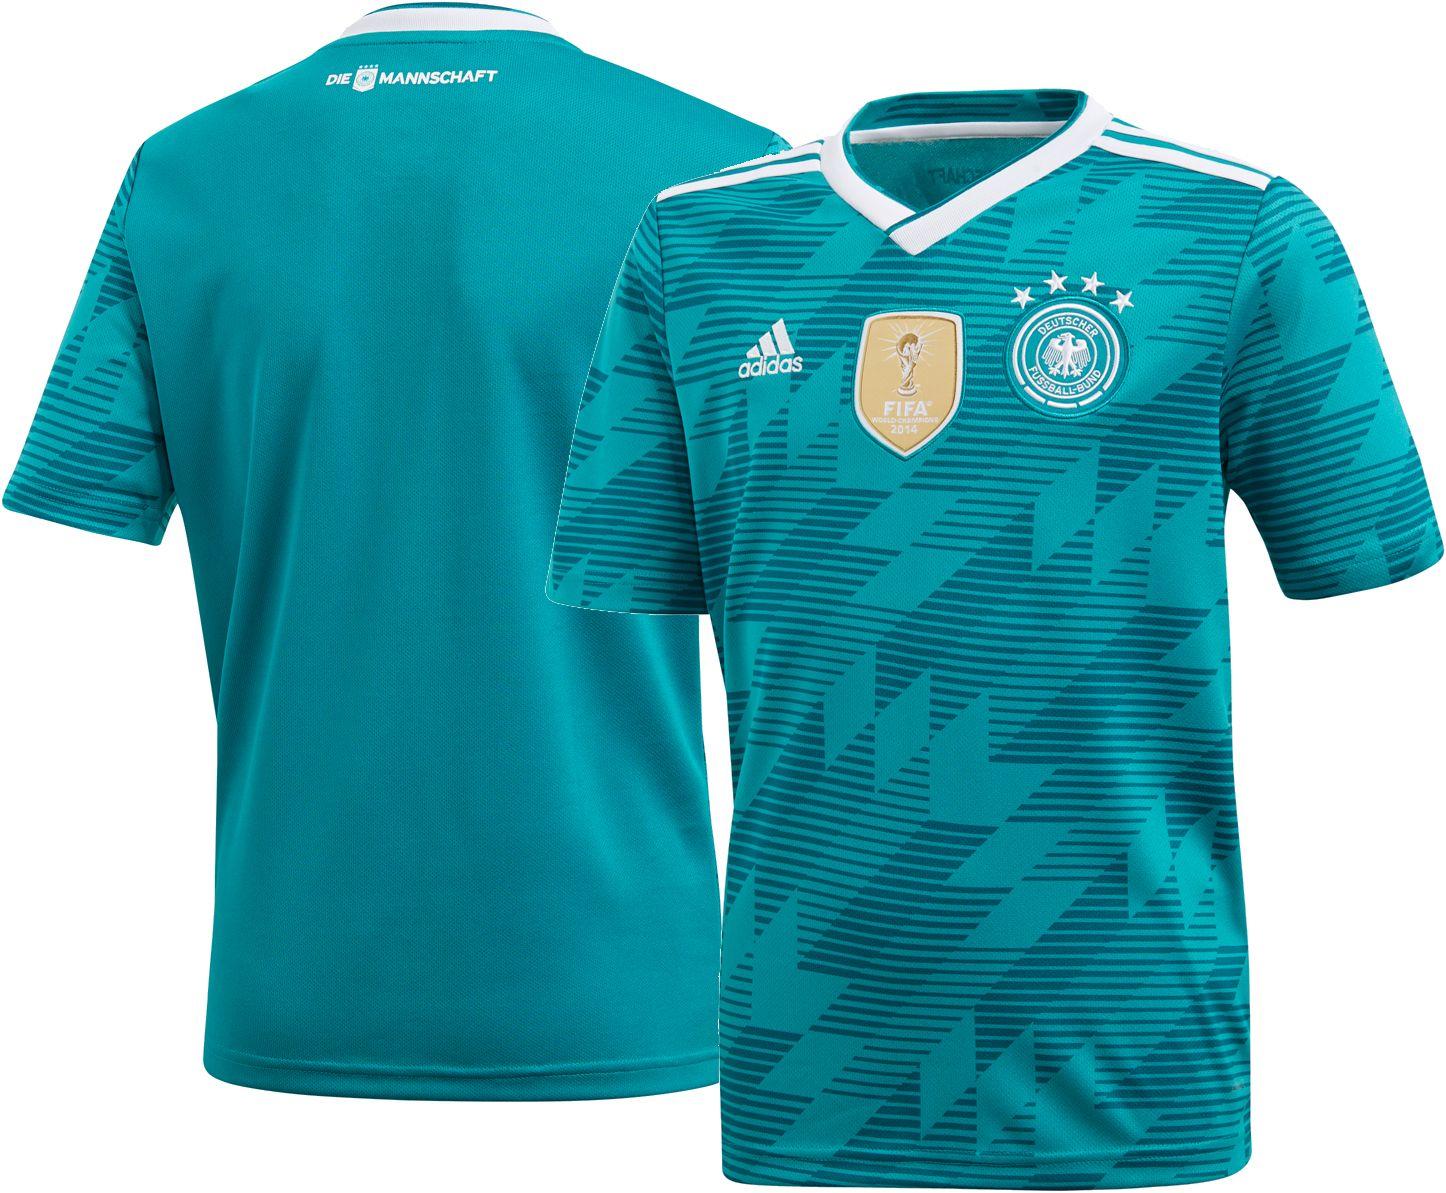 ae3f3ce8fdc adidas Youth 2018 Fifa World Cup Germany Stadium Away Replica Jersey, Size:  Medium, Team